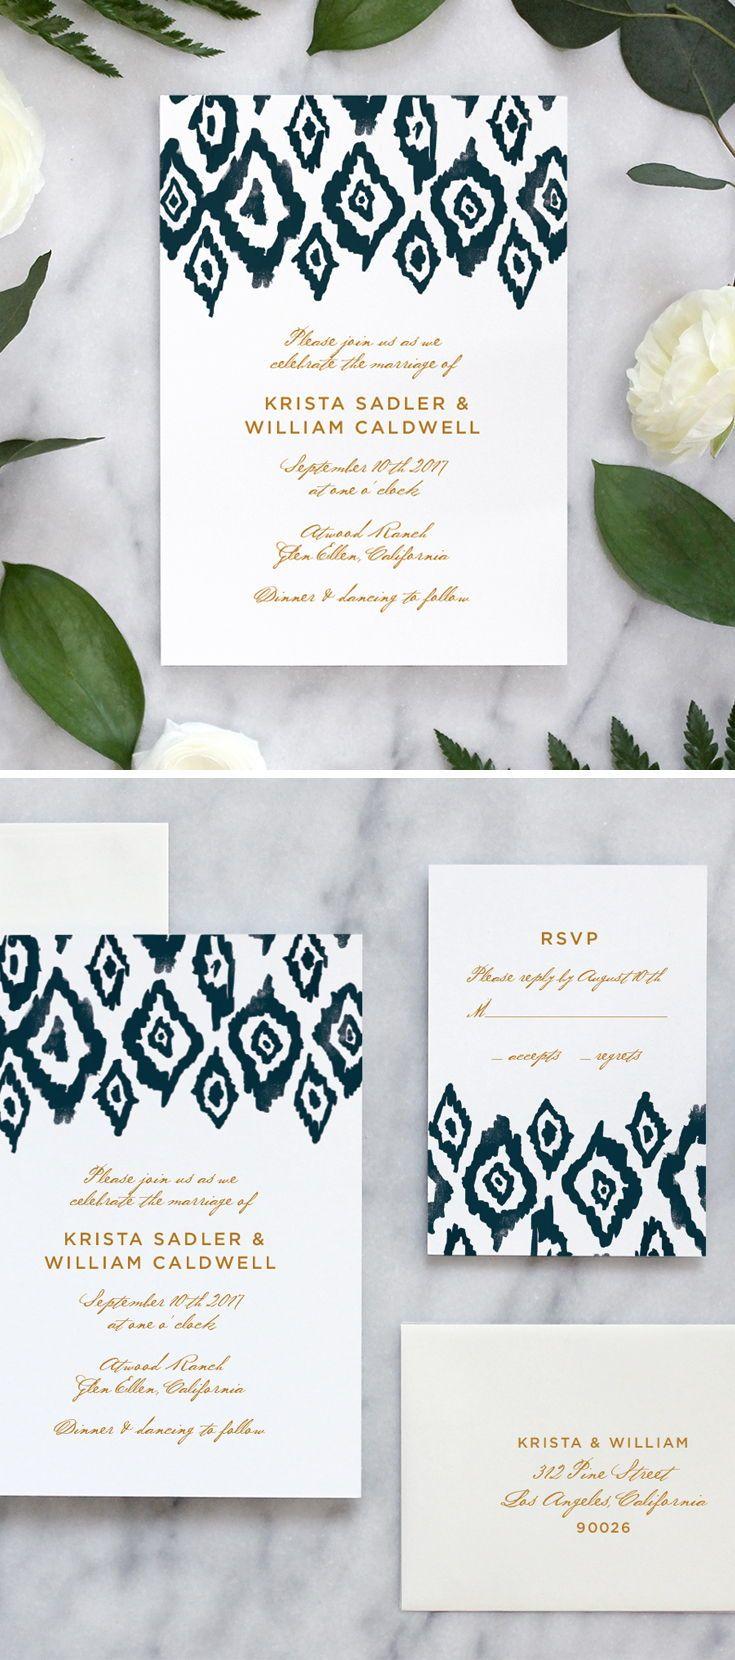 Ikat Watercolor Wedding Invitations | Weddings, Beautiful wedding ...